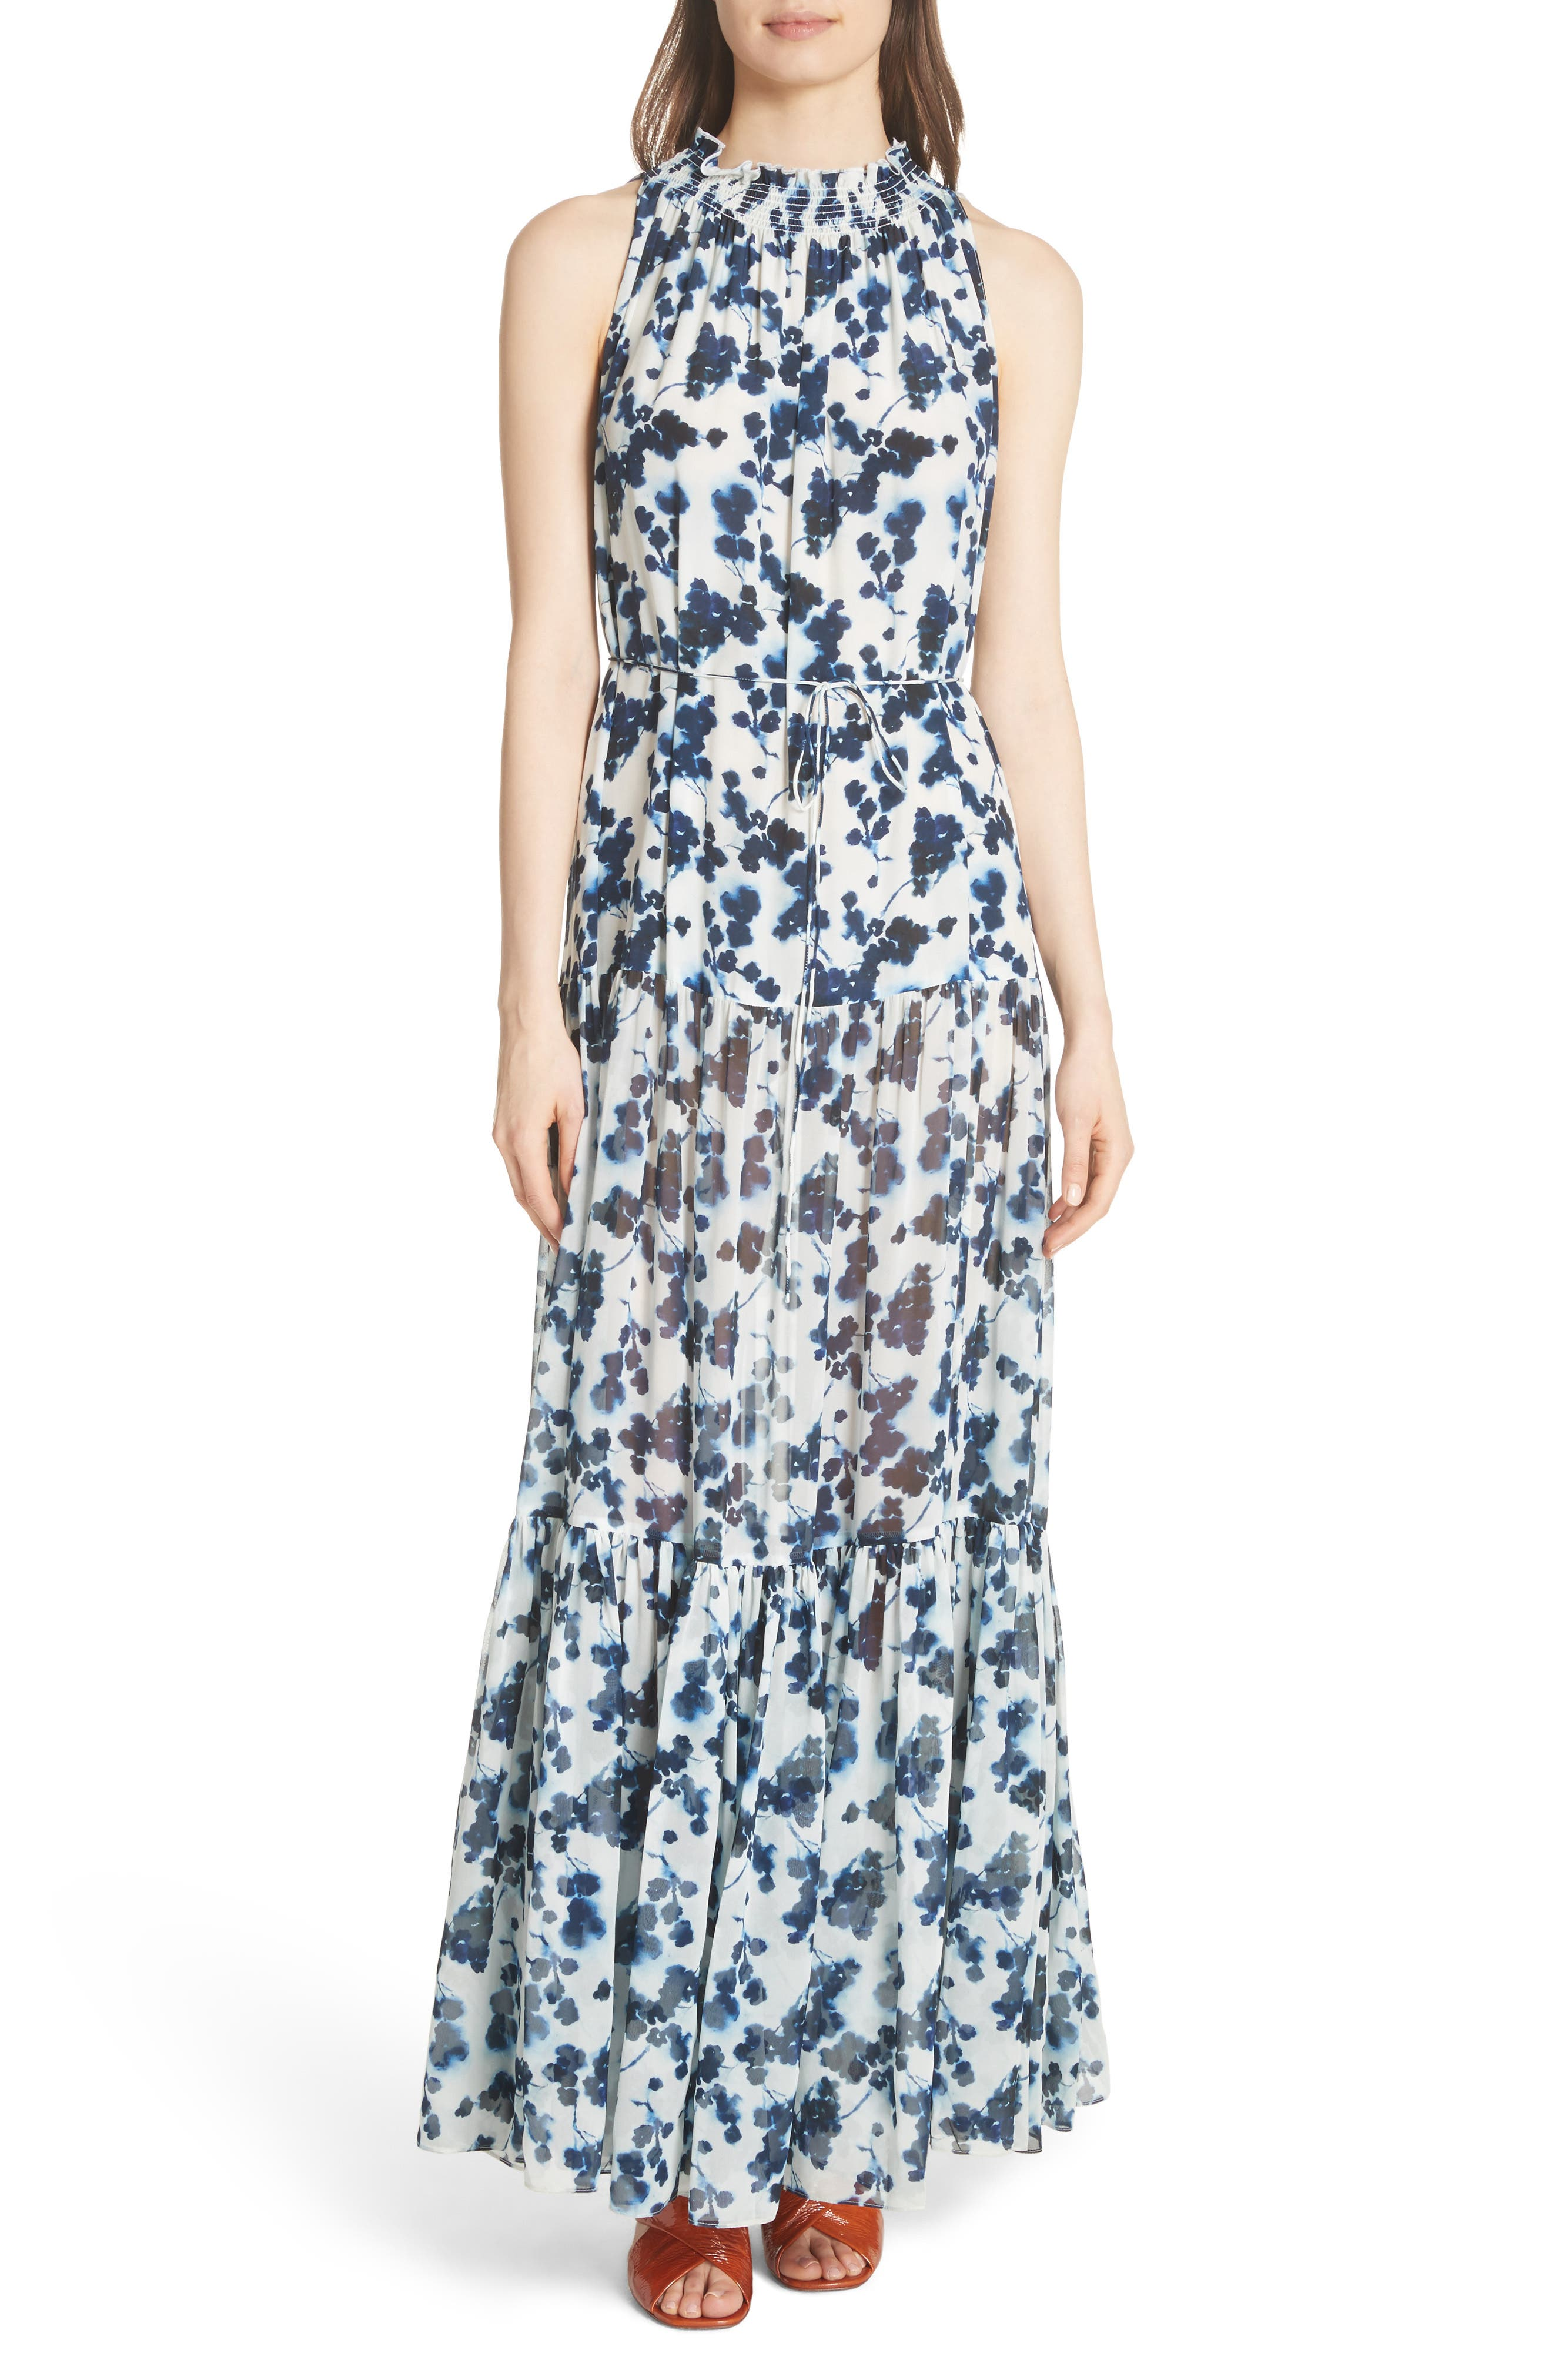 Lani P Floral Print Silk Dress,                         Main,                         color, 426